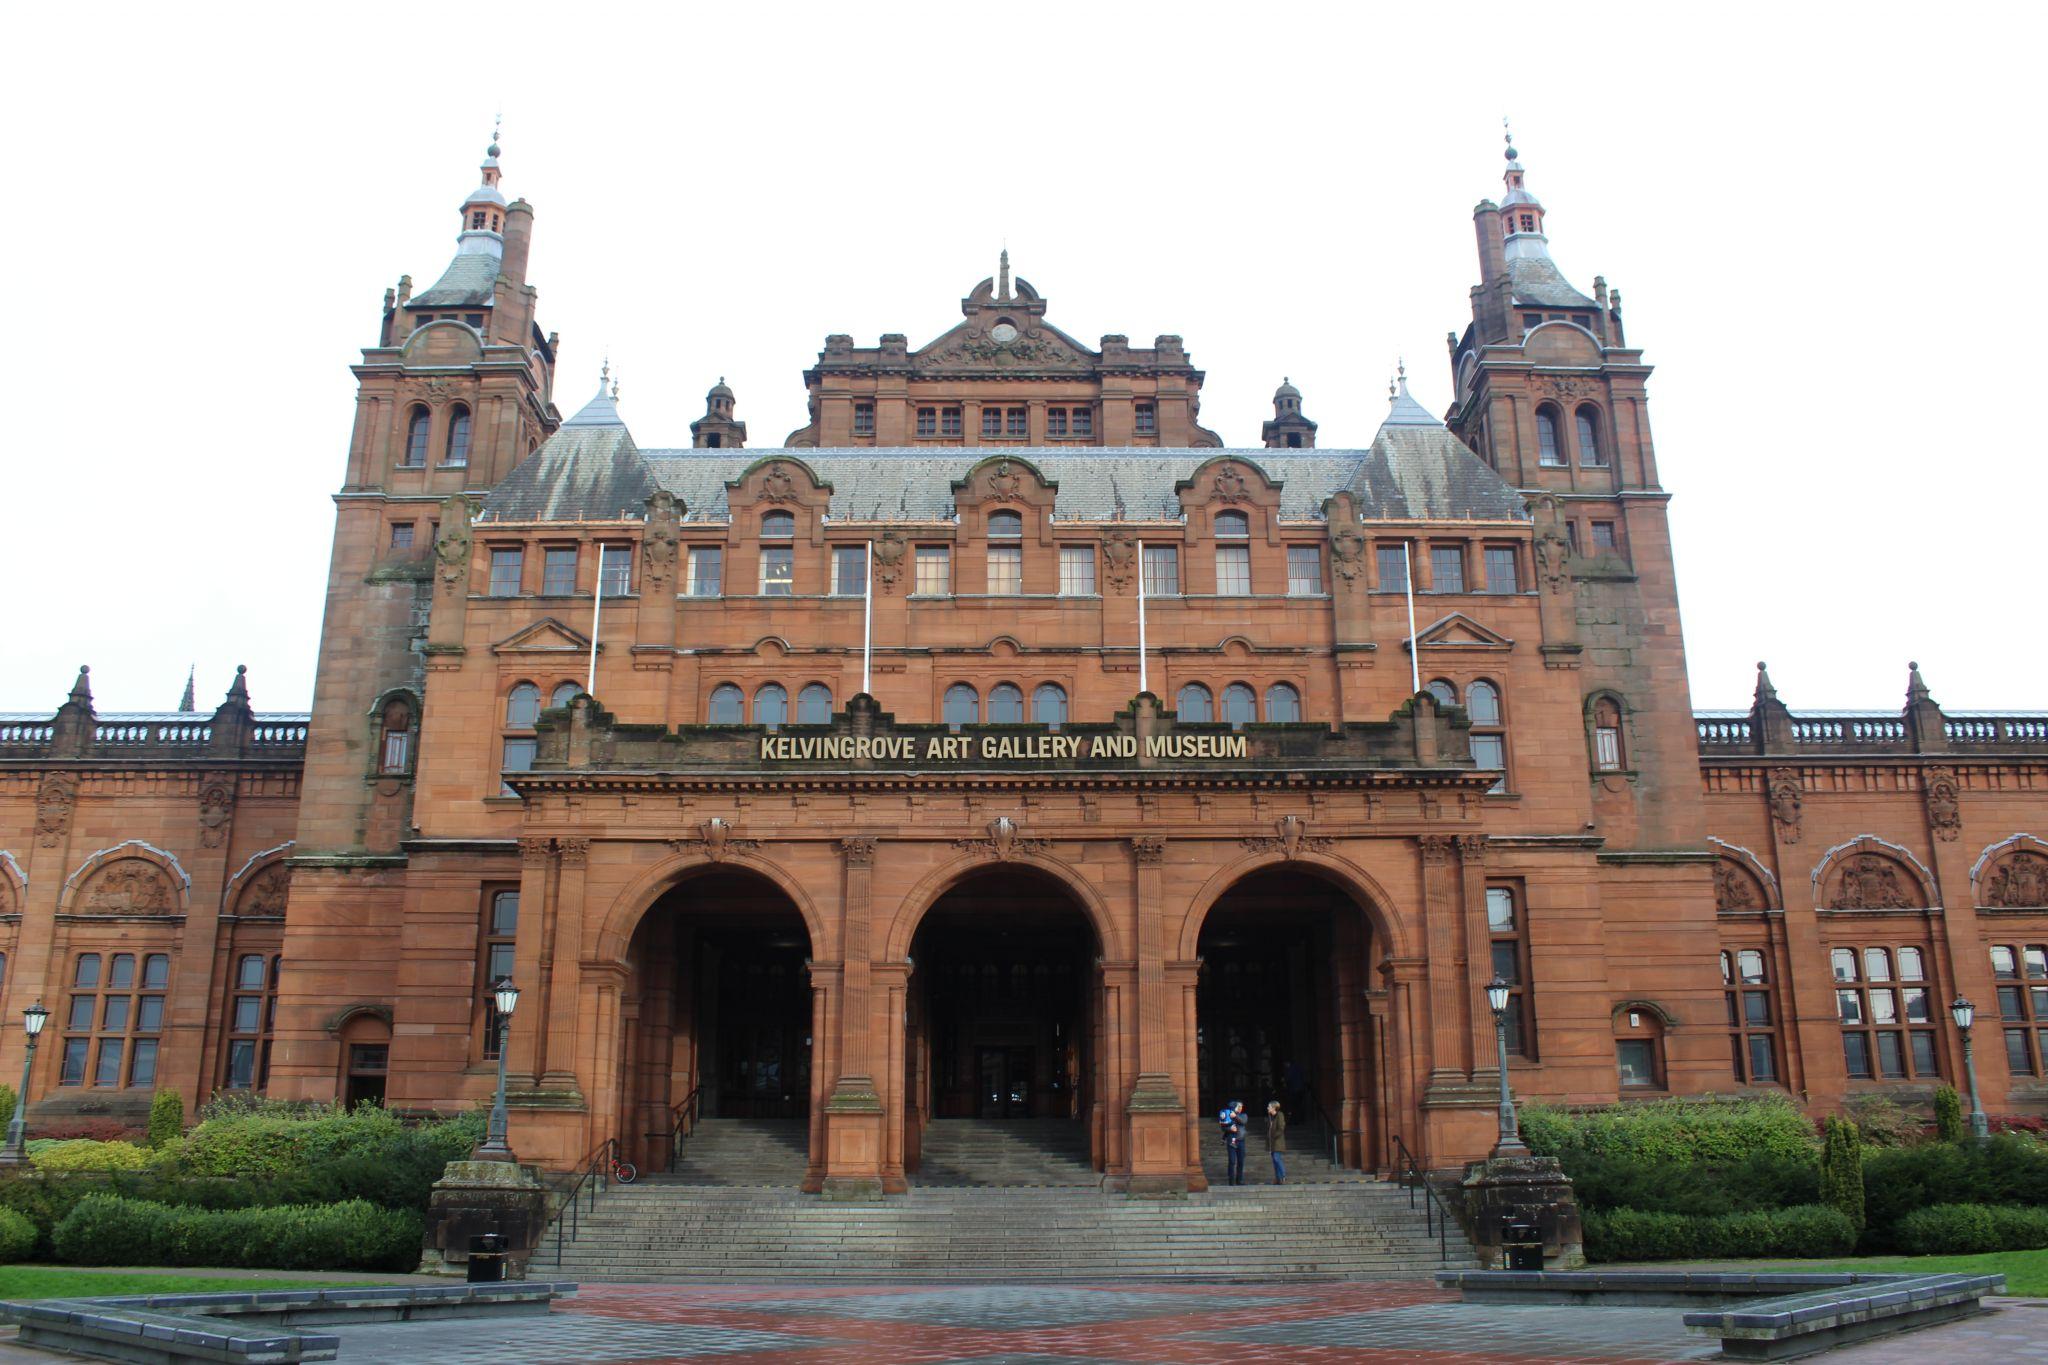 Kelvingrove Art Gallery and Museum, United Kingdom